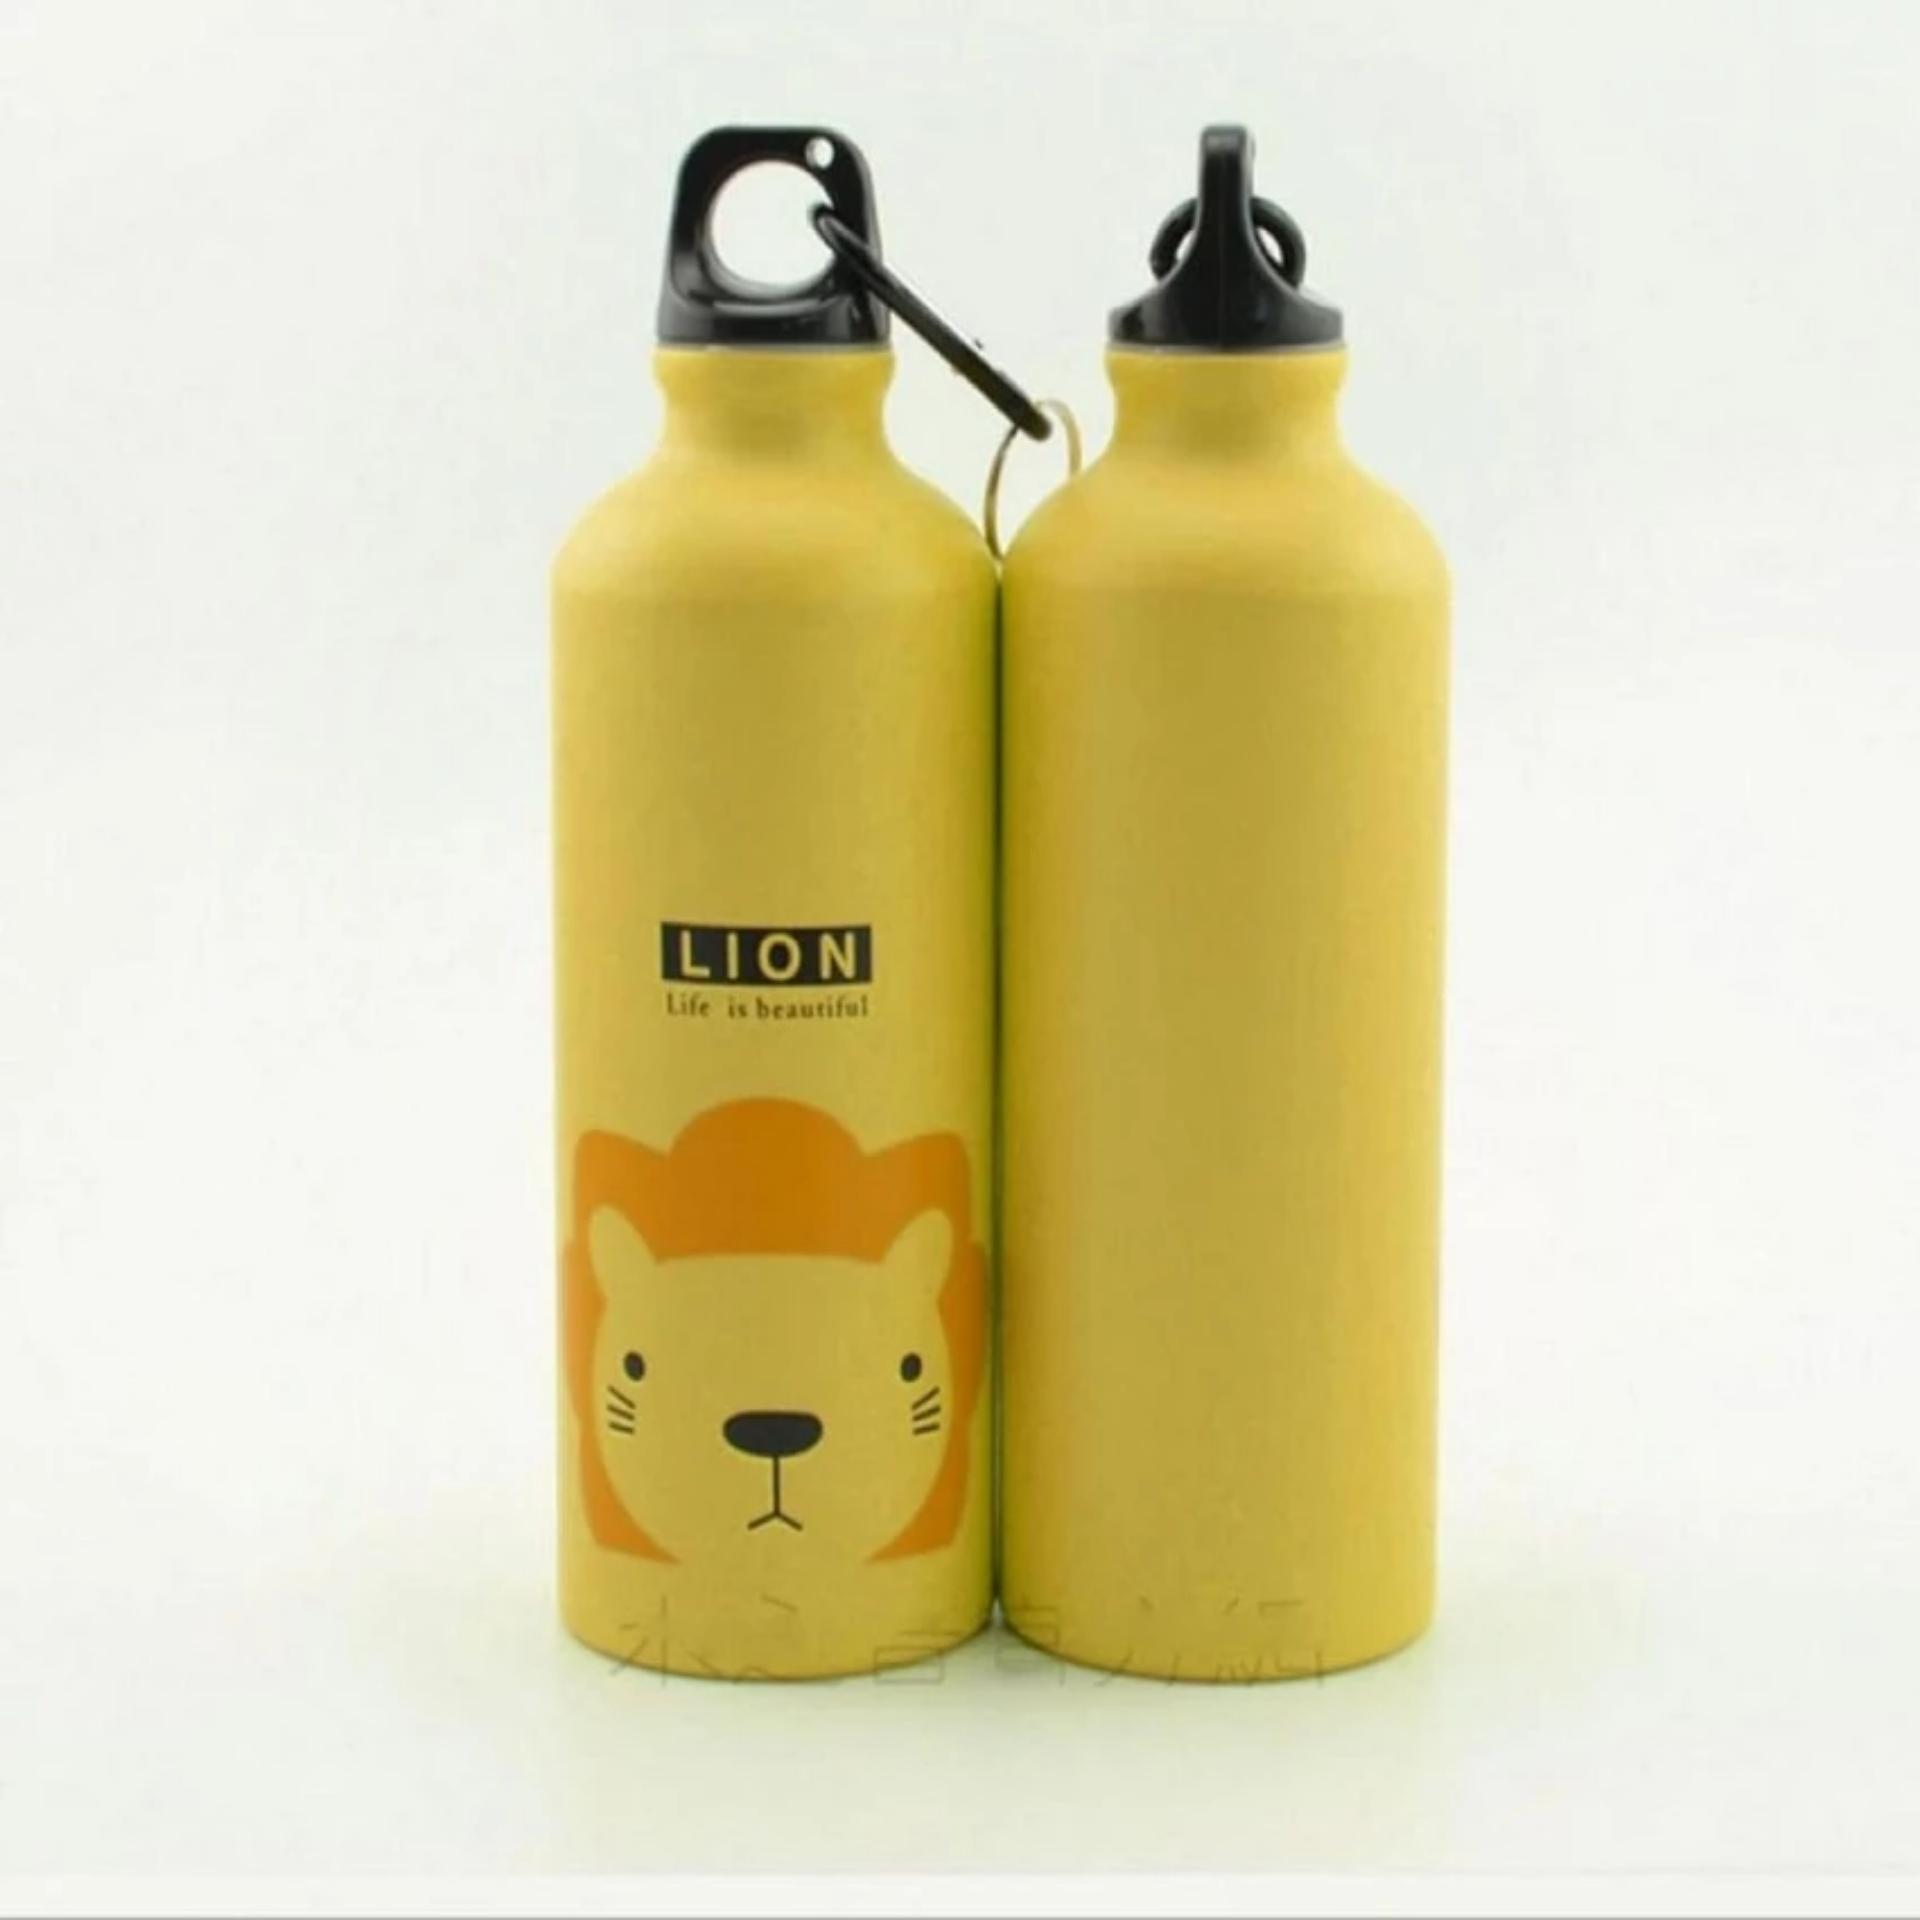 Kategori Botol Minum Olahraga Murah Spesifikasi Review Harga New B Dengan Spray 600ml Aiueo Aluminium Karakter 500ml Karabiner